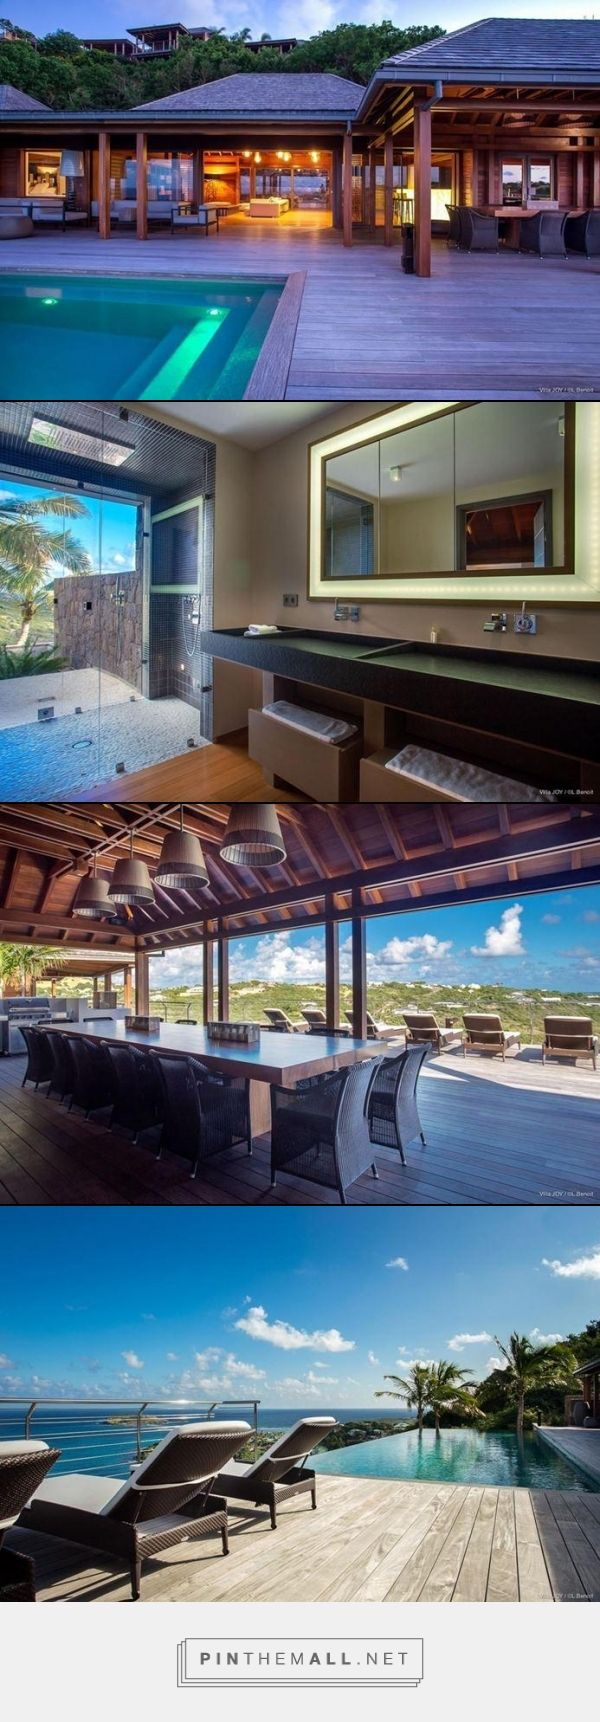 203 best st. barths villas images on pinterest | villas, caribbean